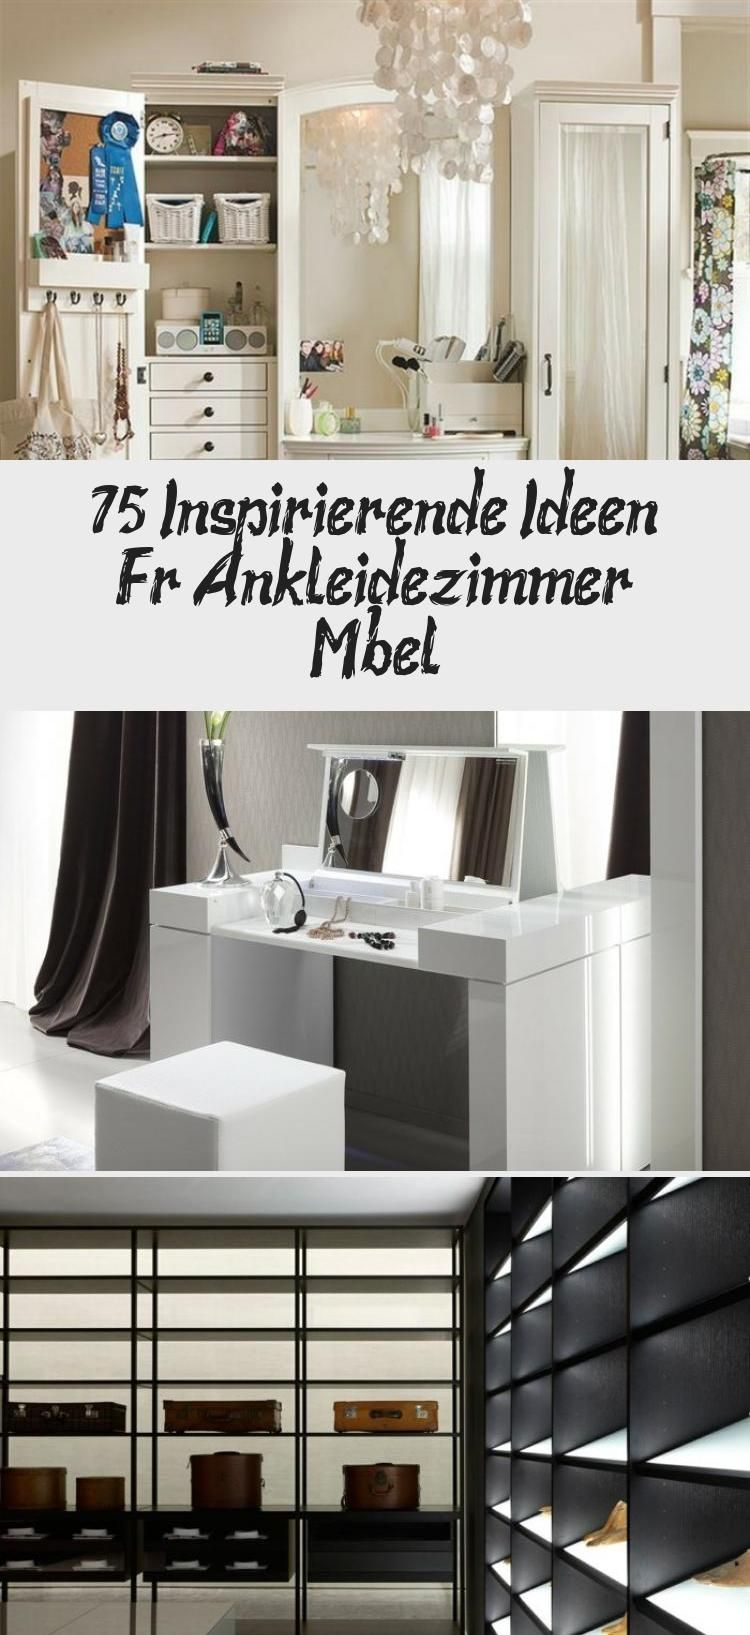 75 Inspirierende Ideen Fur Ankleidezimmer Mobel In 2020 Home Decor Decor Furniture